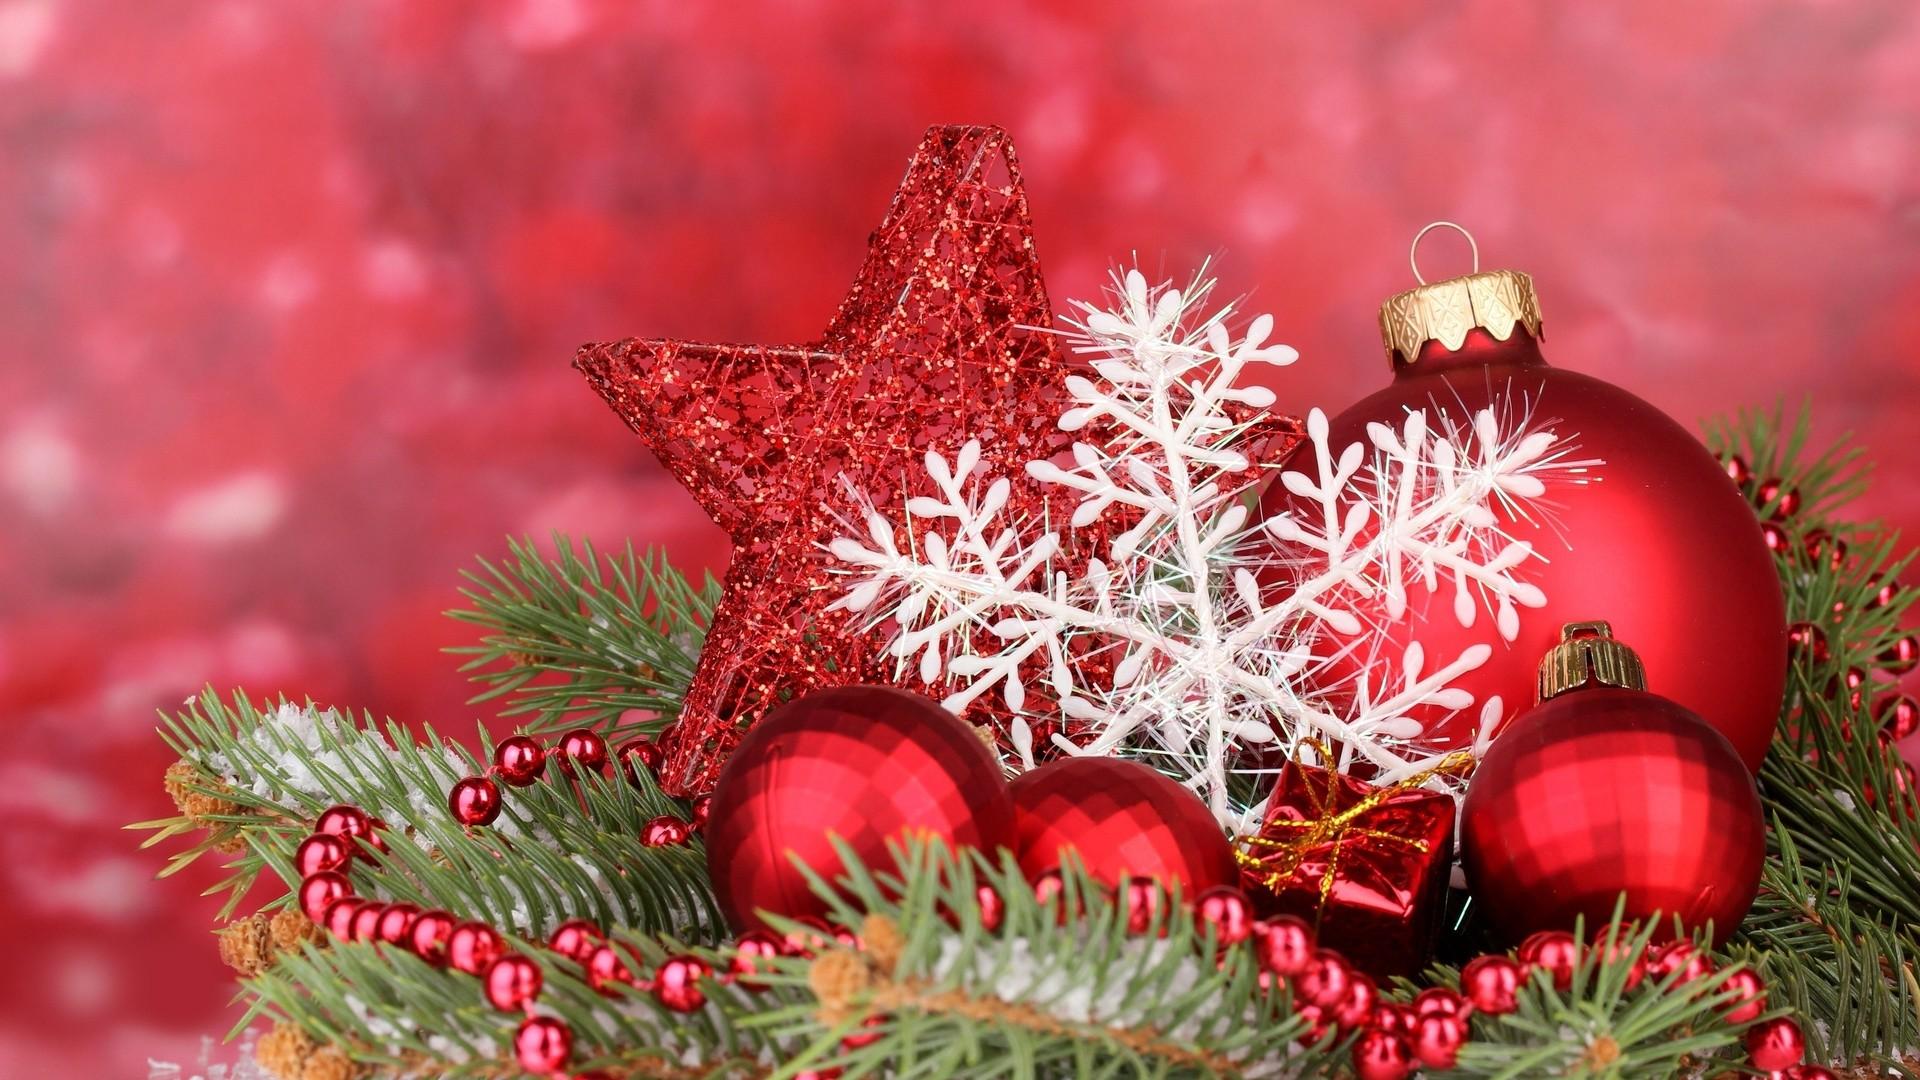 Christmas Desktop wallpaper free download